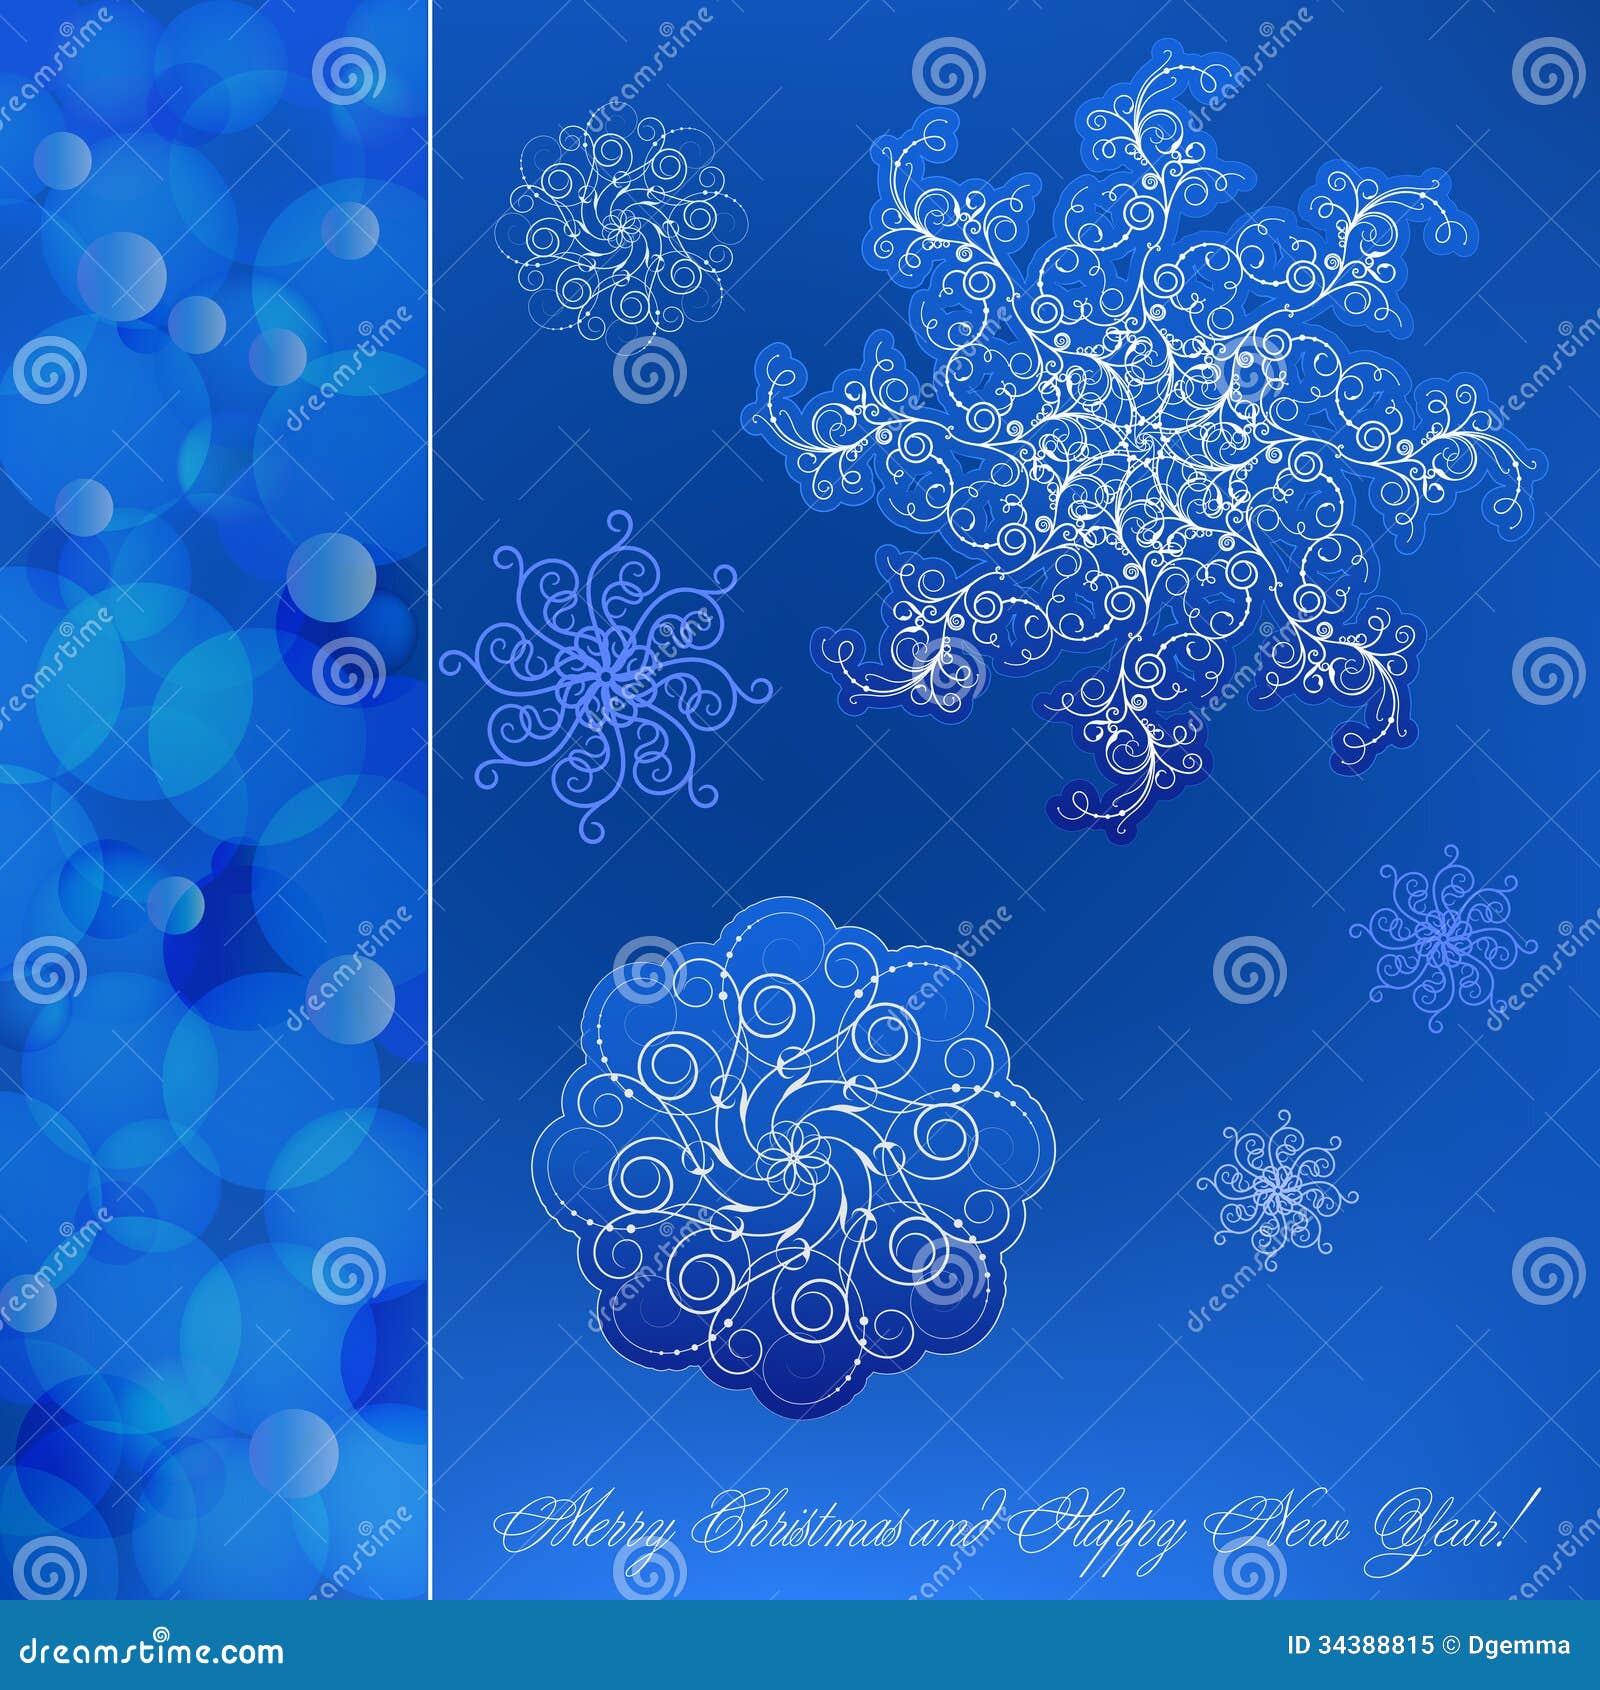 Blue Christmas Card Royalty Free Stock Photo Image 34388815